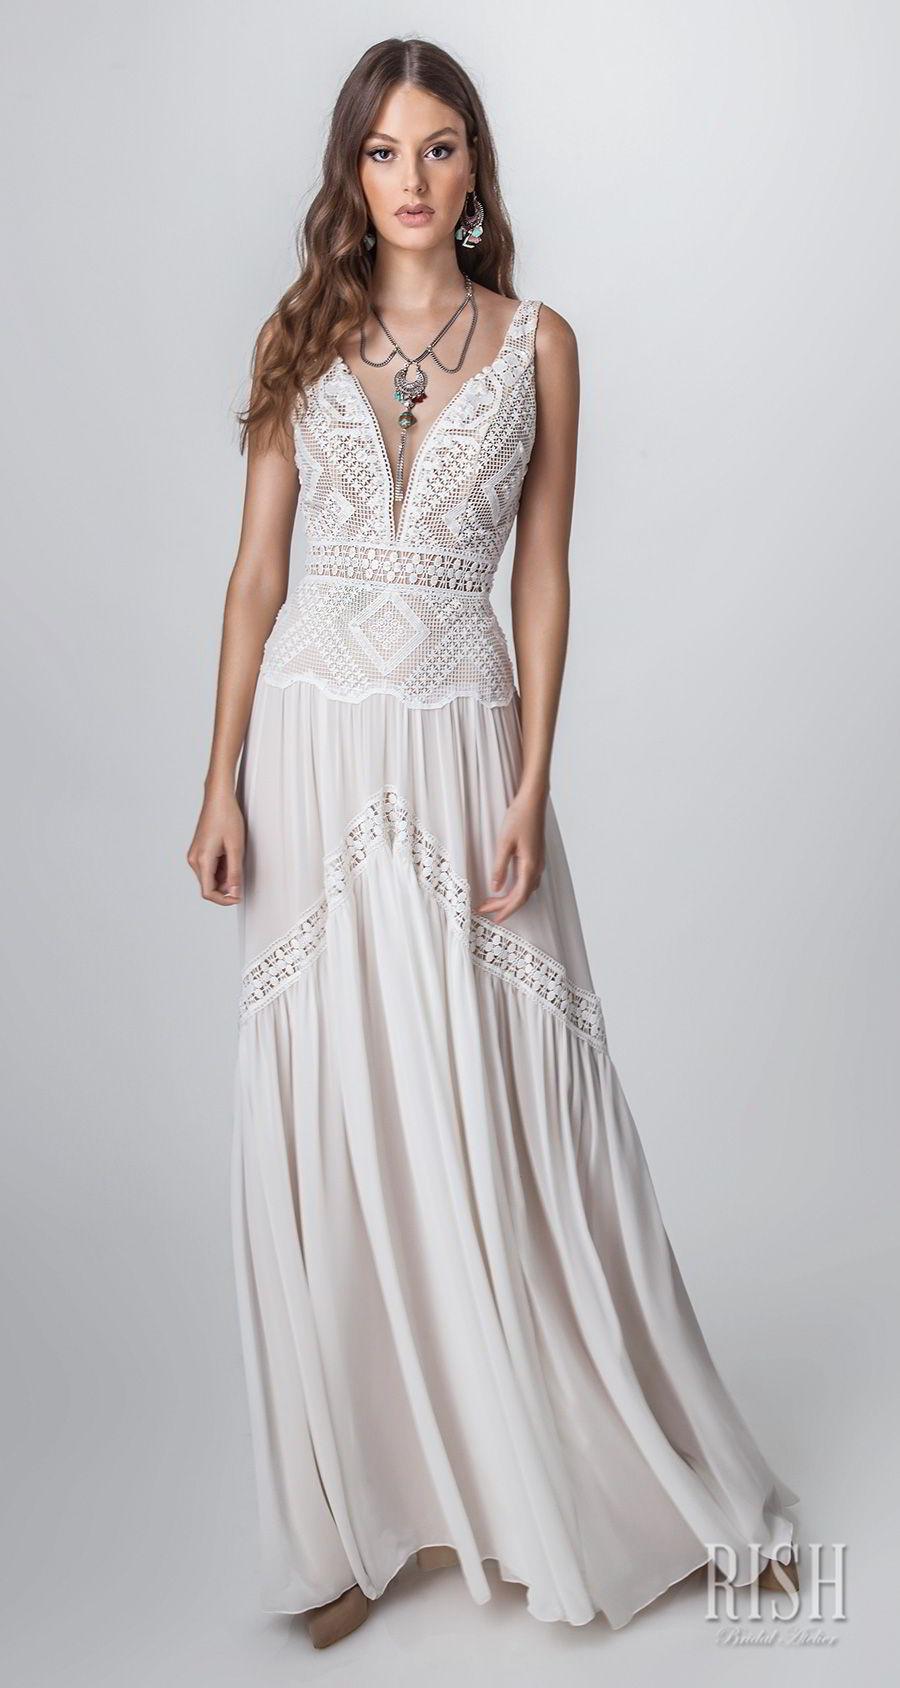 rish bridal sun dance 2018 sleeveless deep sweetheart neckline heavily embellished bodice bohemian soft a  line wedding dress open v back sweep train (layla) mv